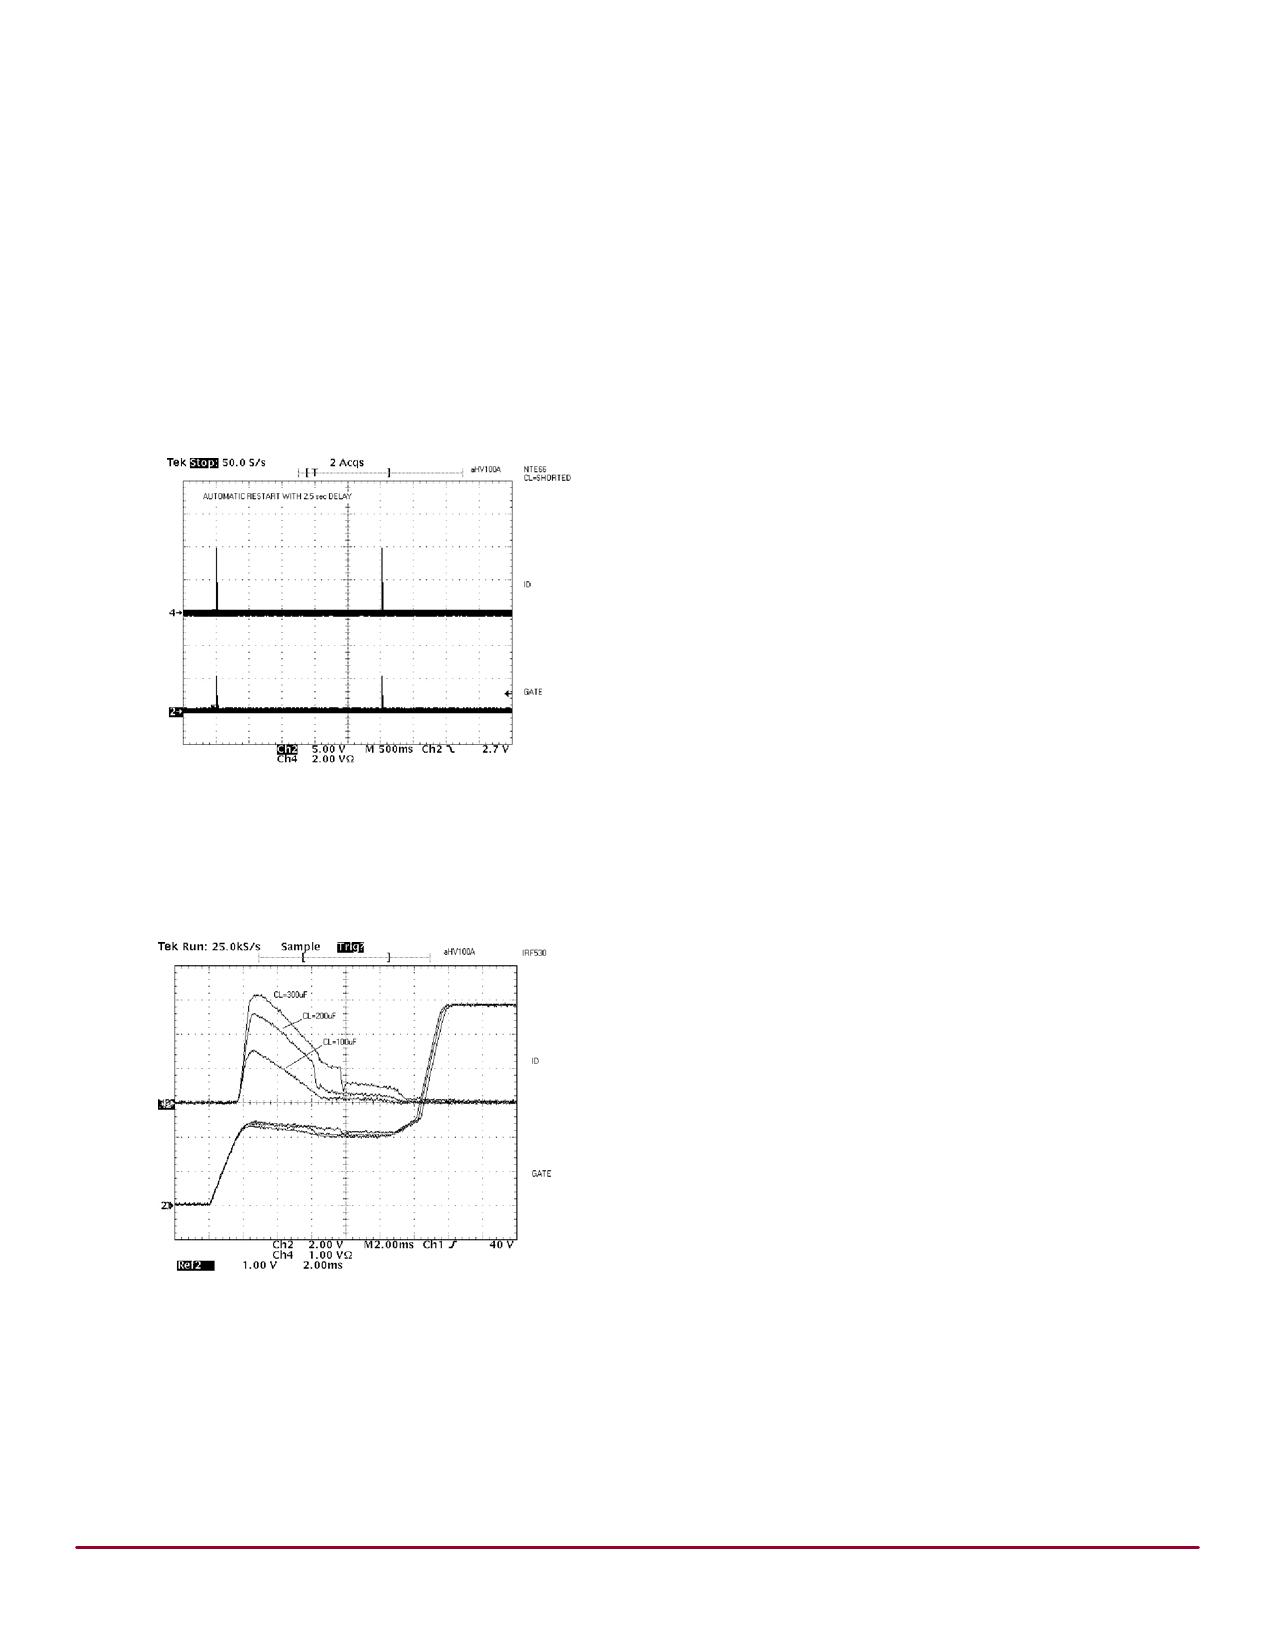 HV100K5 電子部品, 半導体